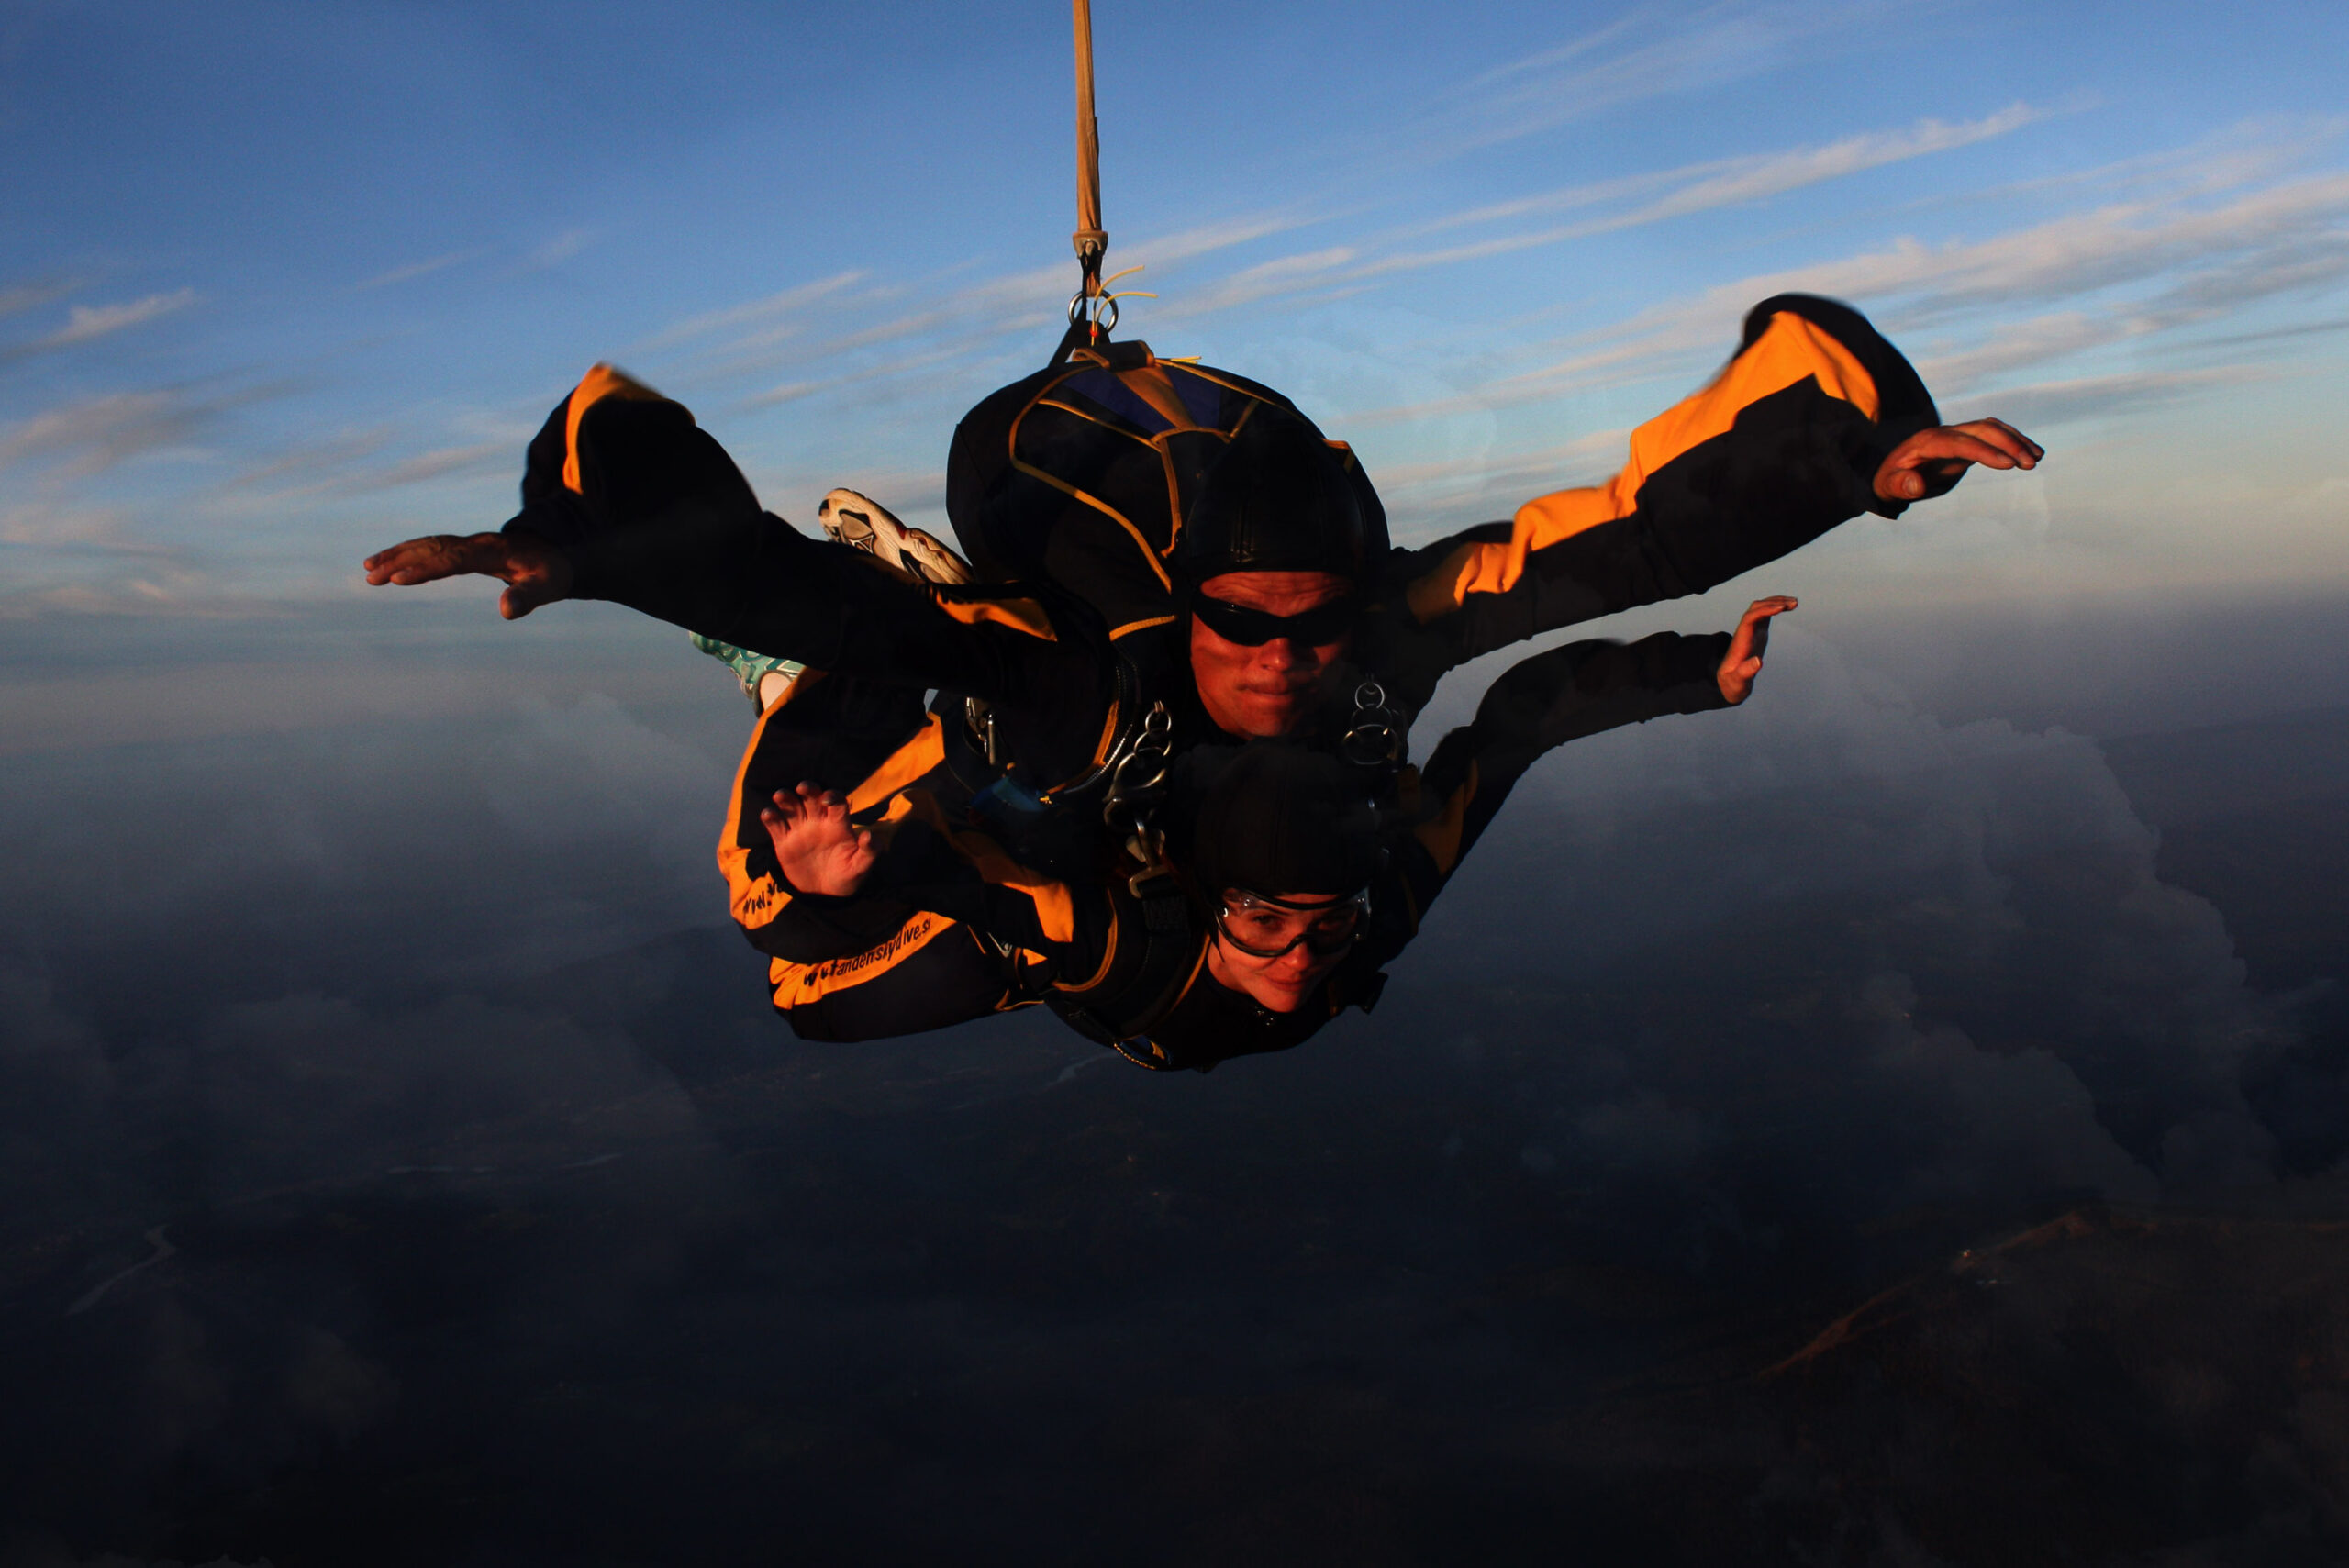 tandemski skok